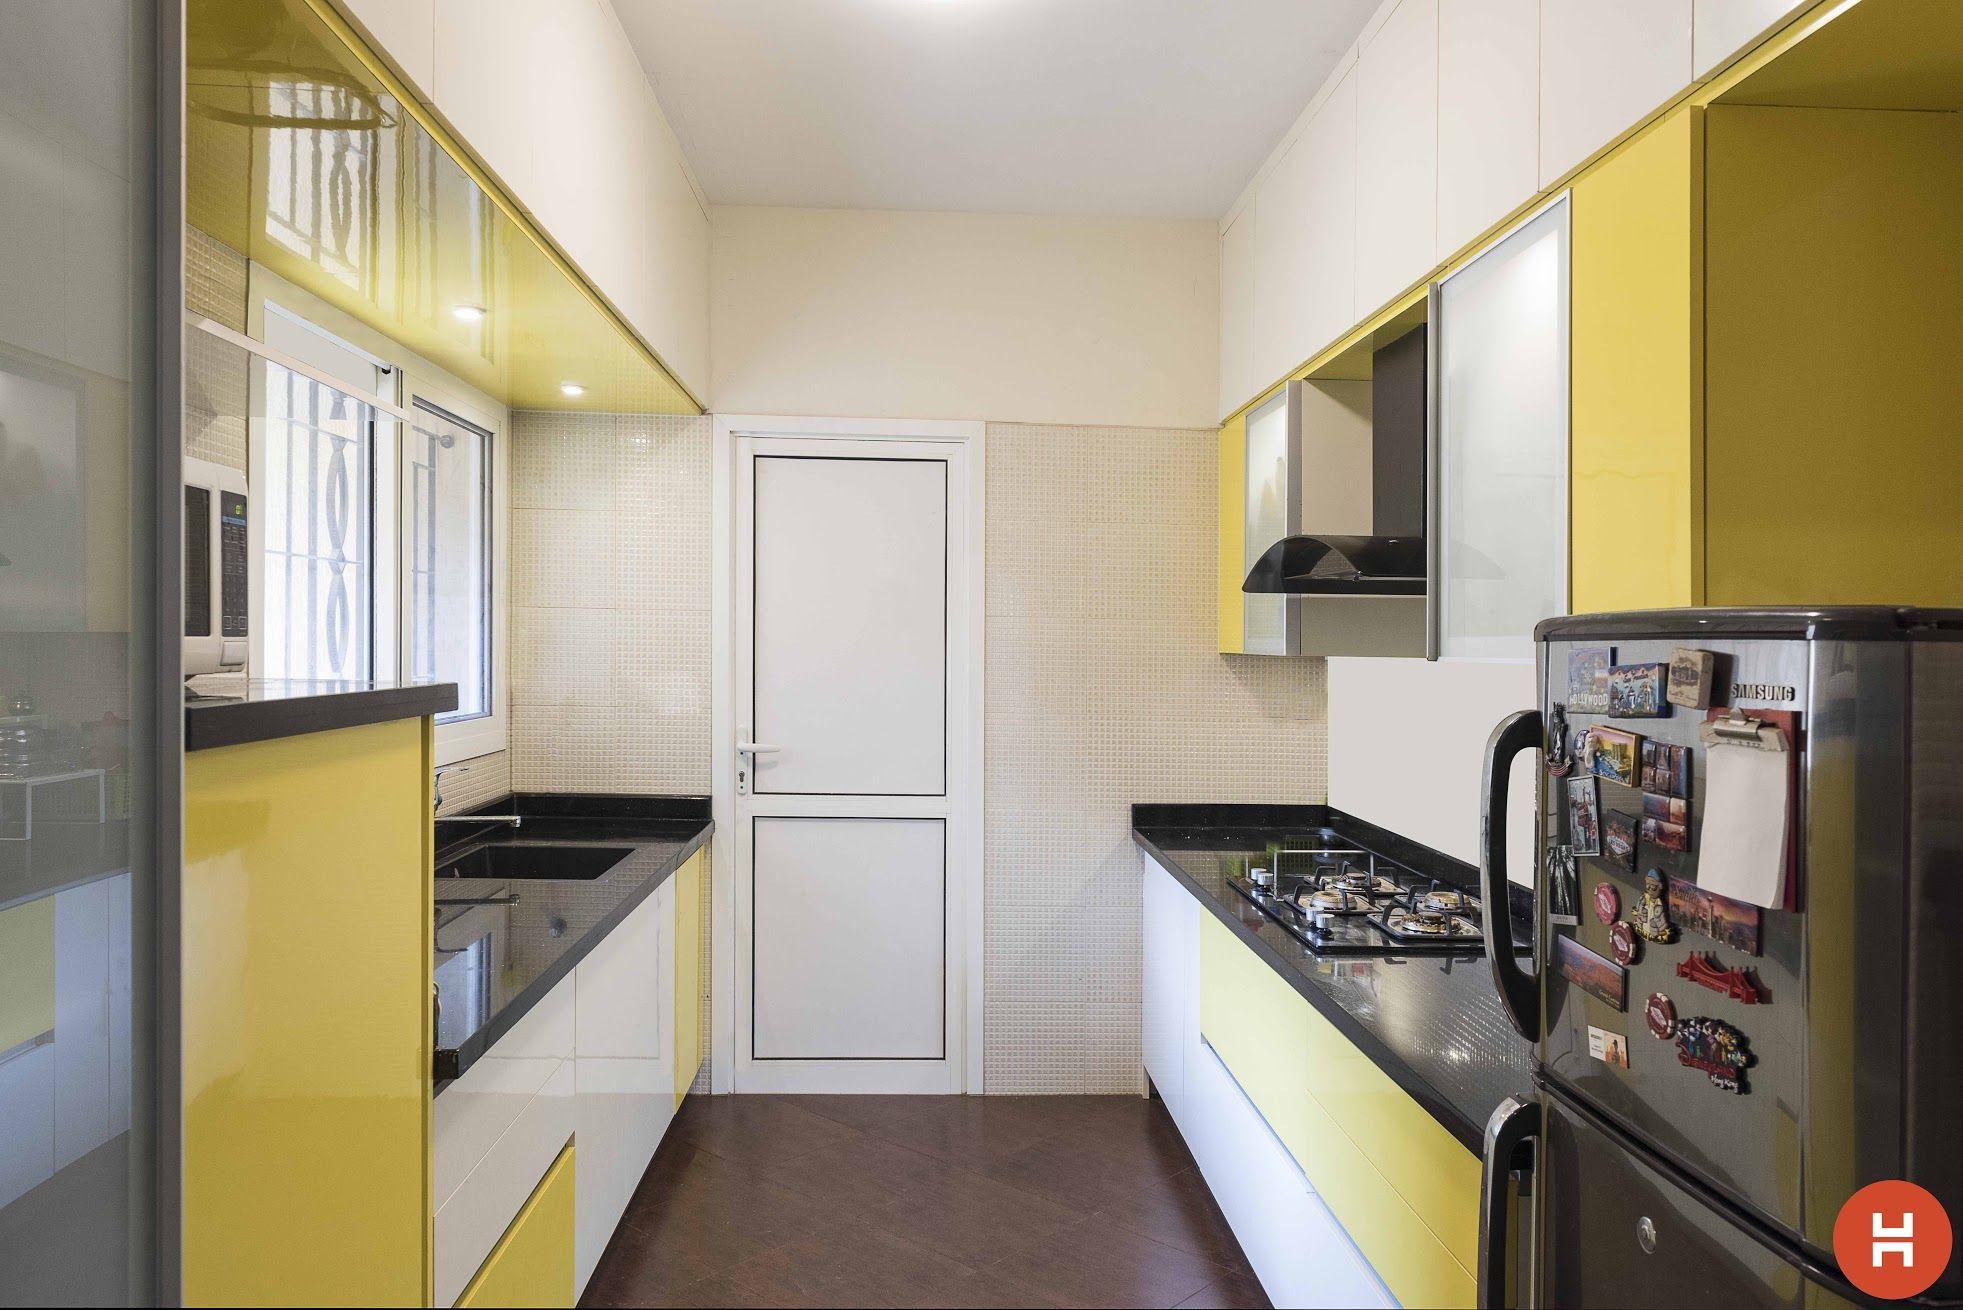 Green modular kitchen designs   Parallel shaped Modular kitchen ...